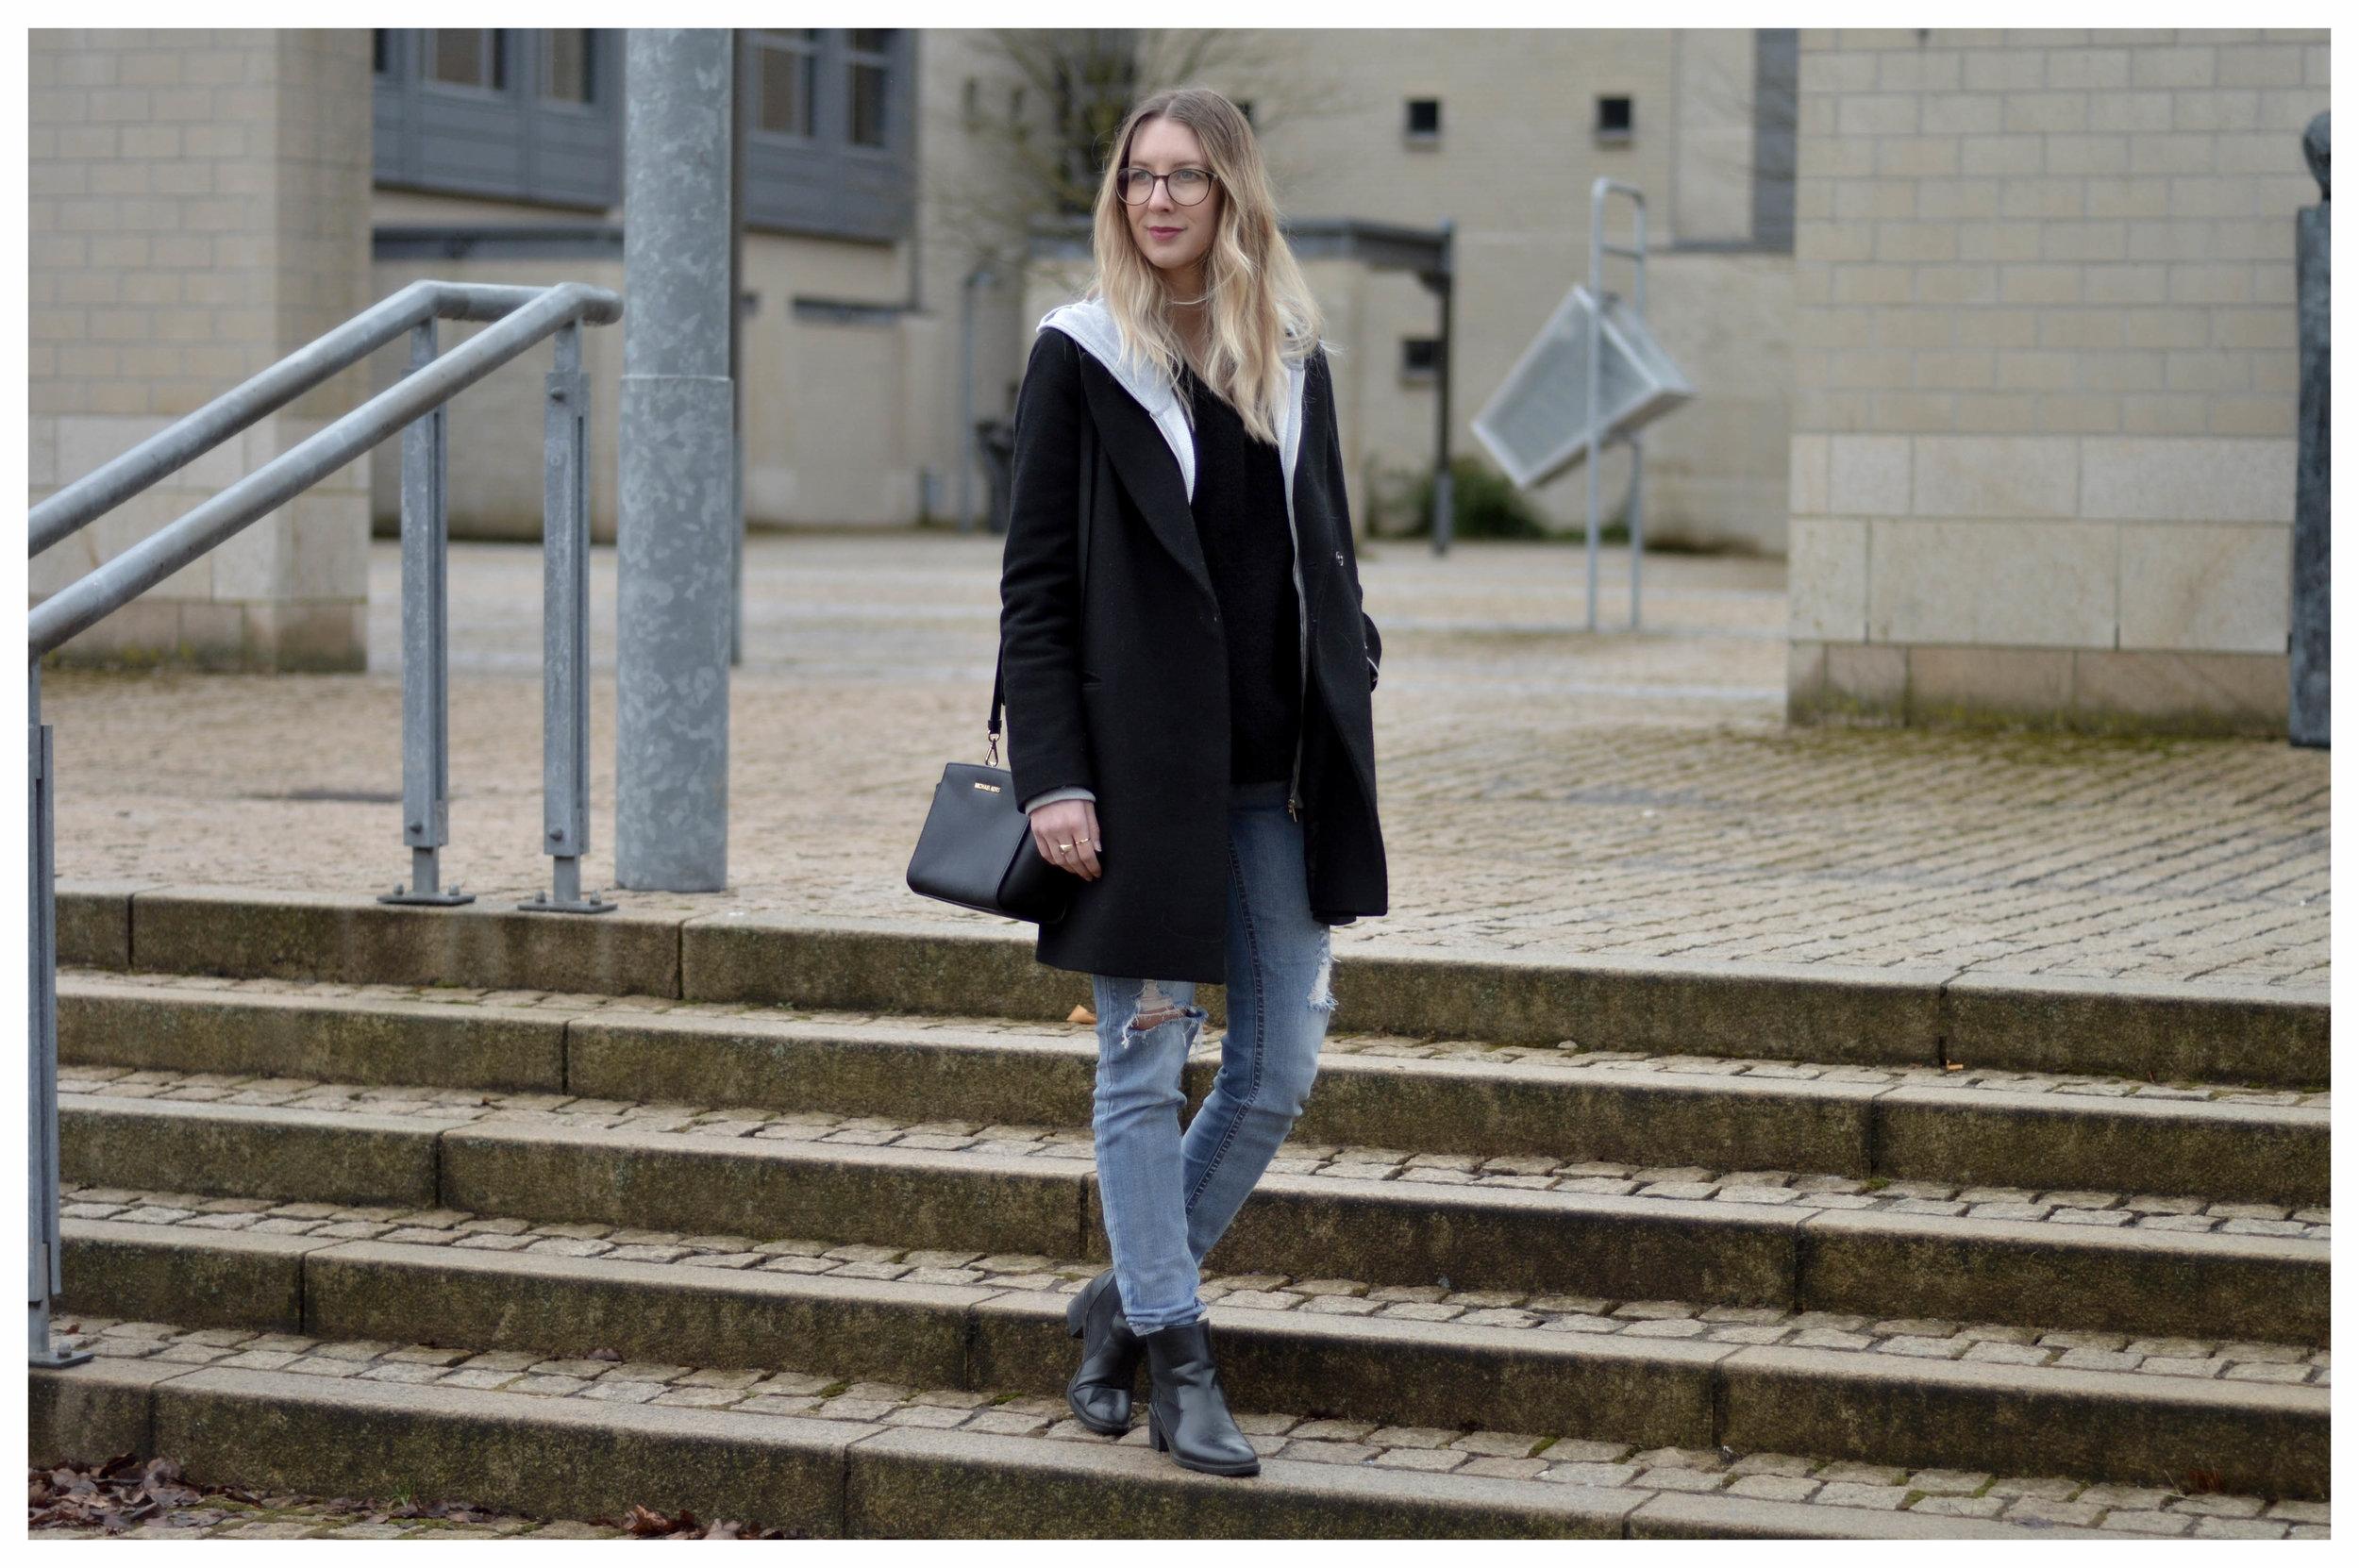 Black Coat Hoodie & Ripped Jeans - OSIARAH.COM (26 sur 54).jpg